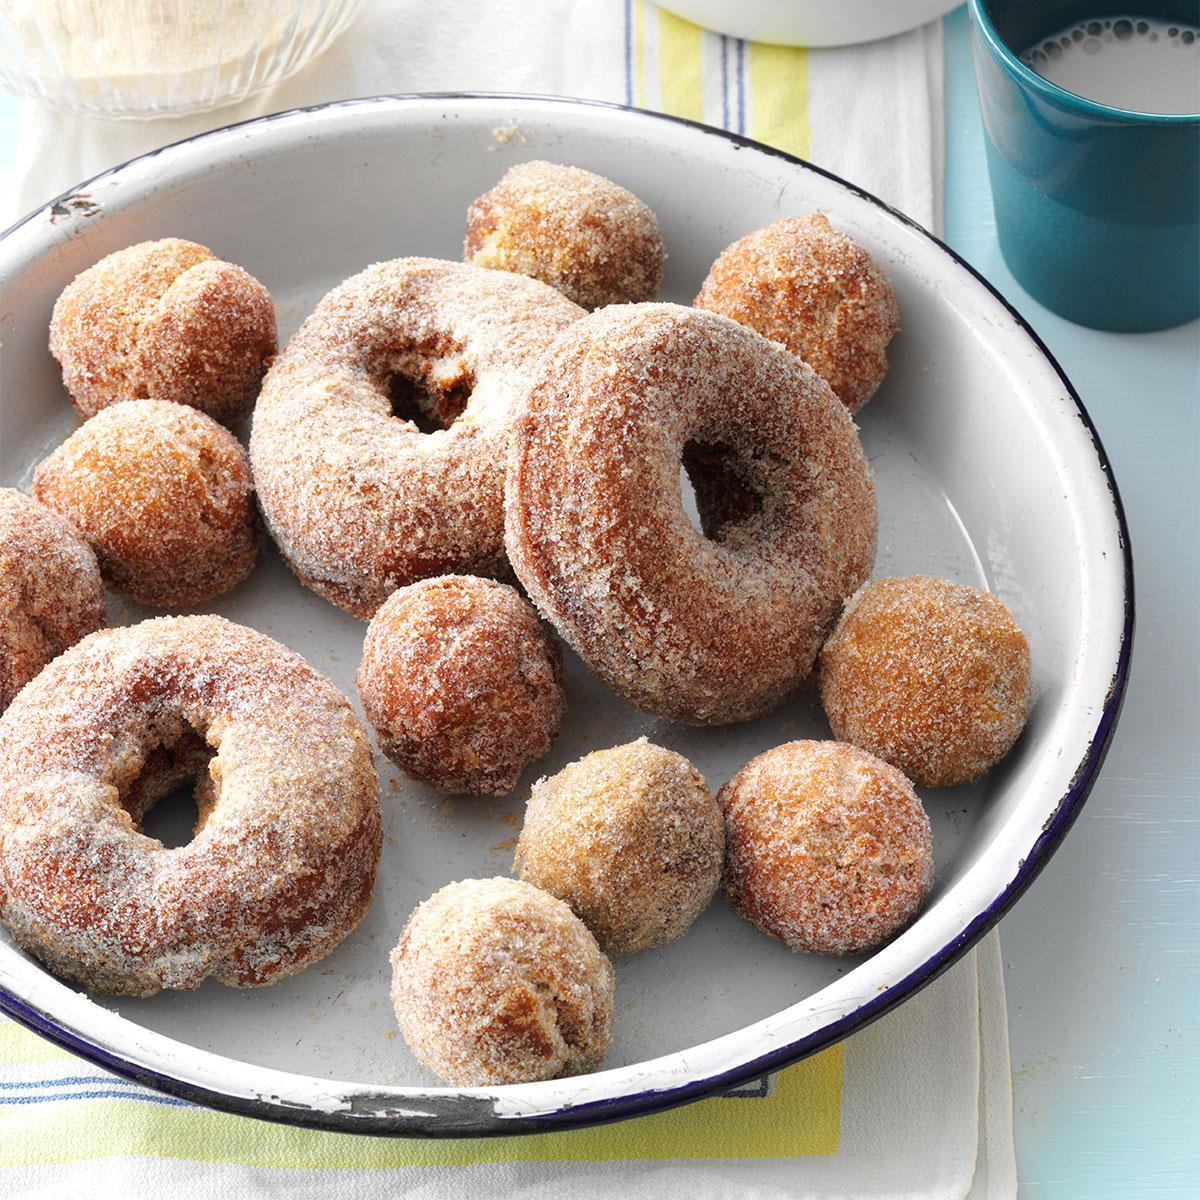 45 Easy Camping Recipes: Apple Cider Doughnuts Recipe